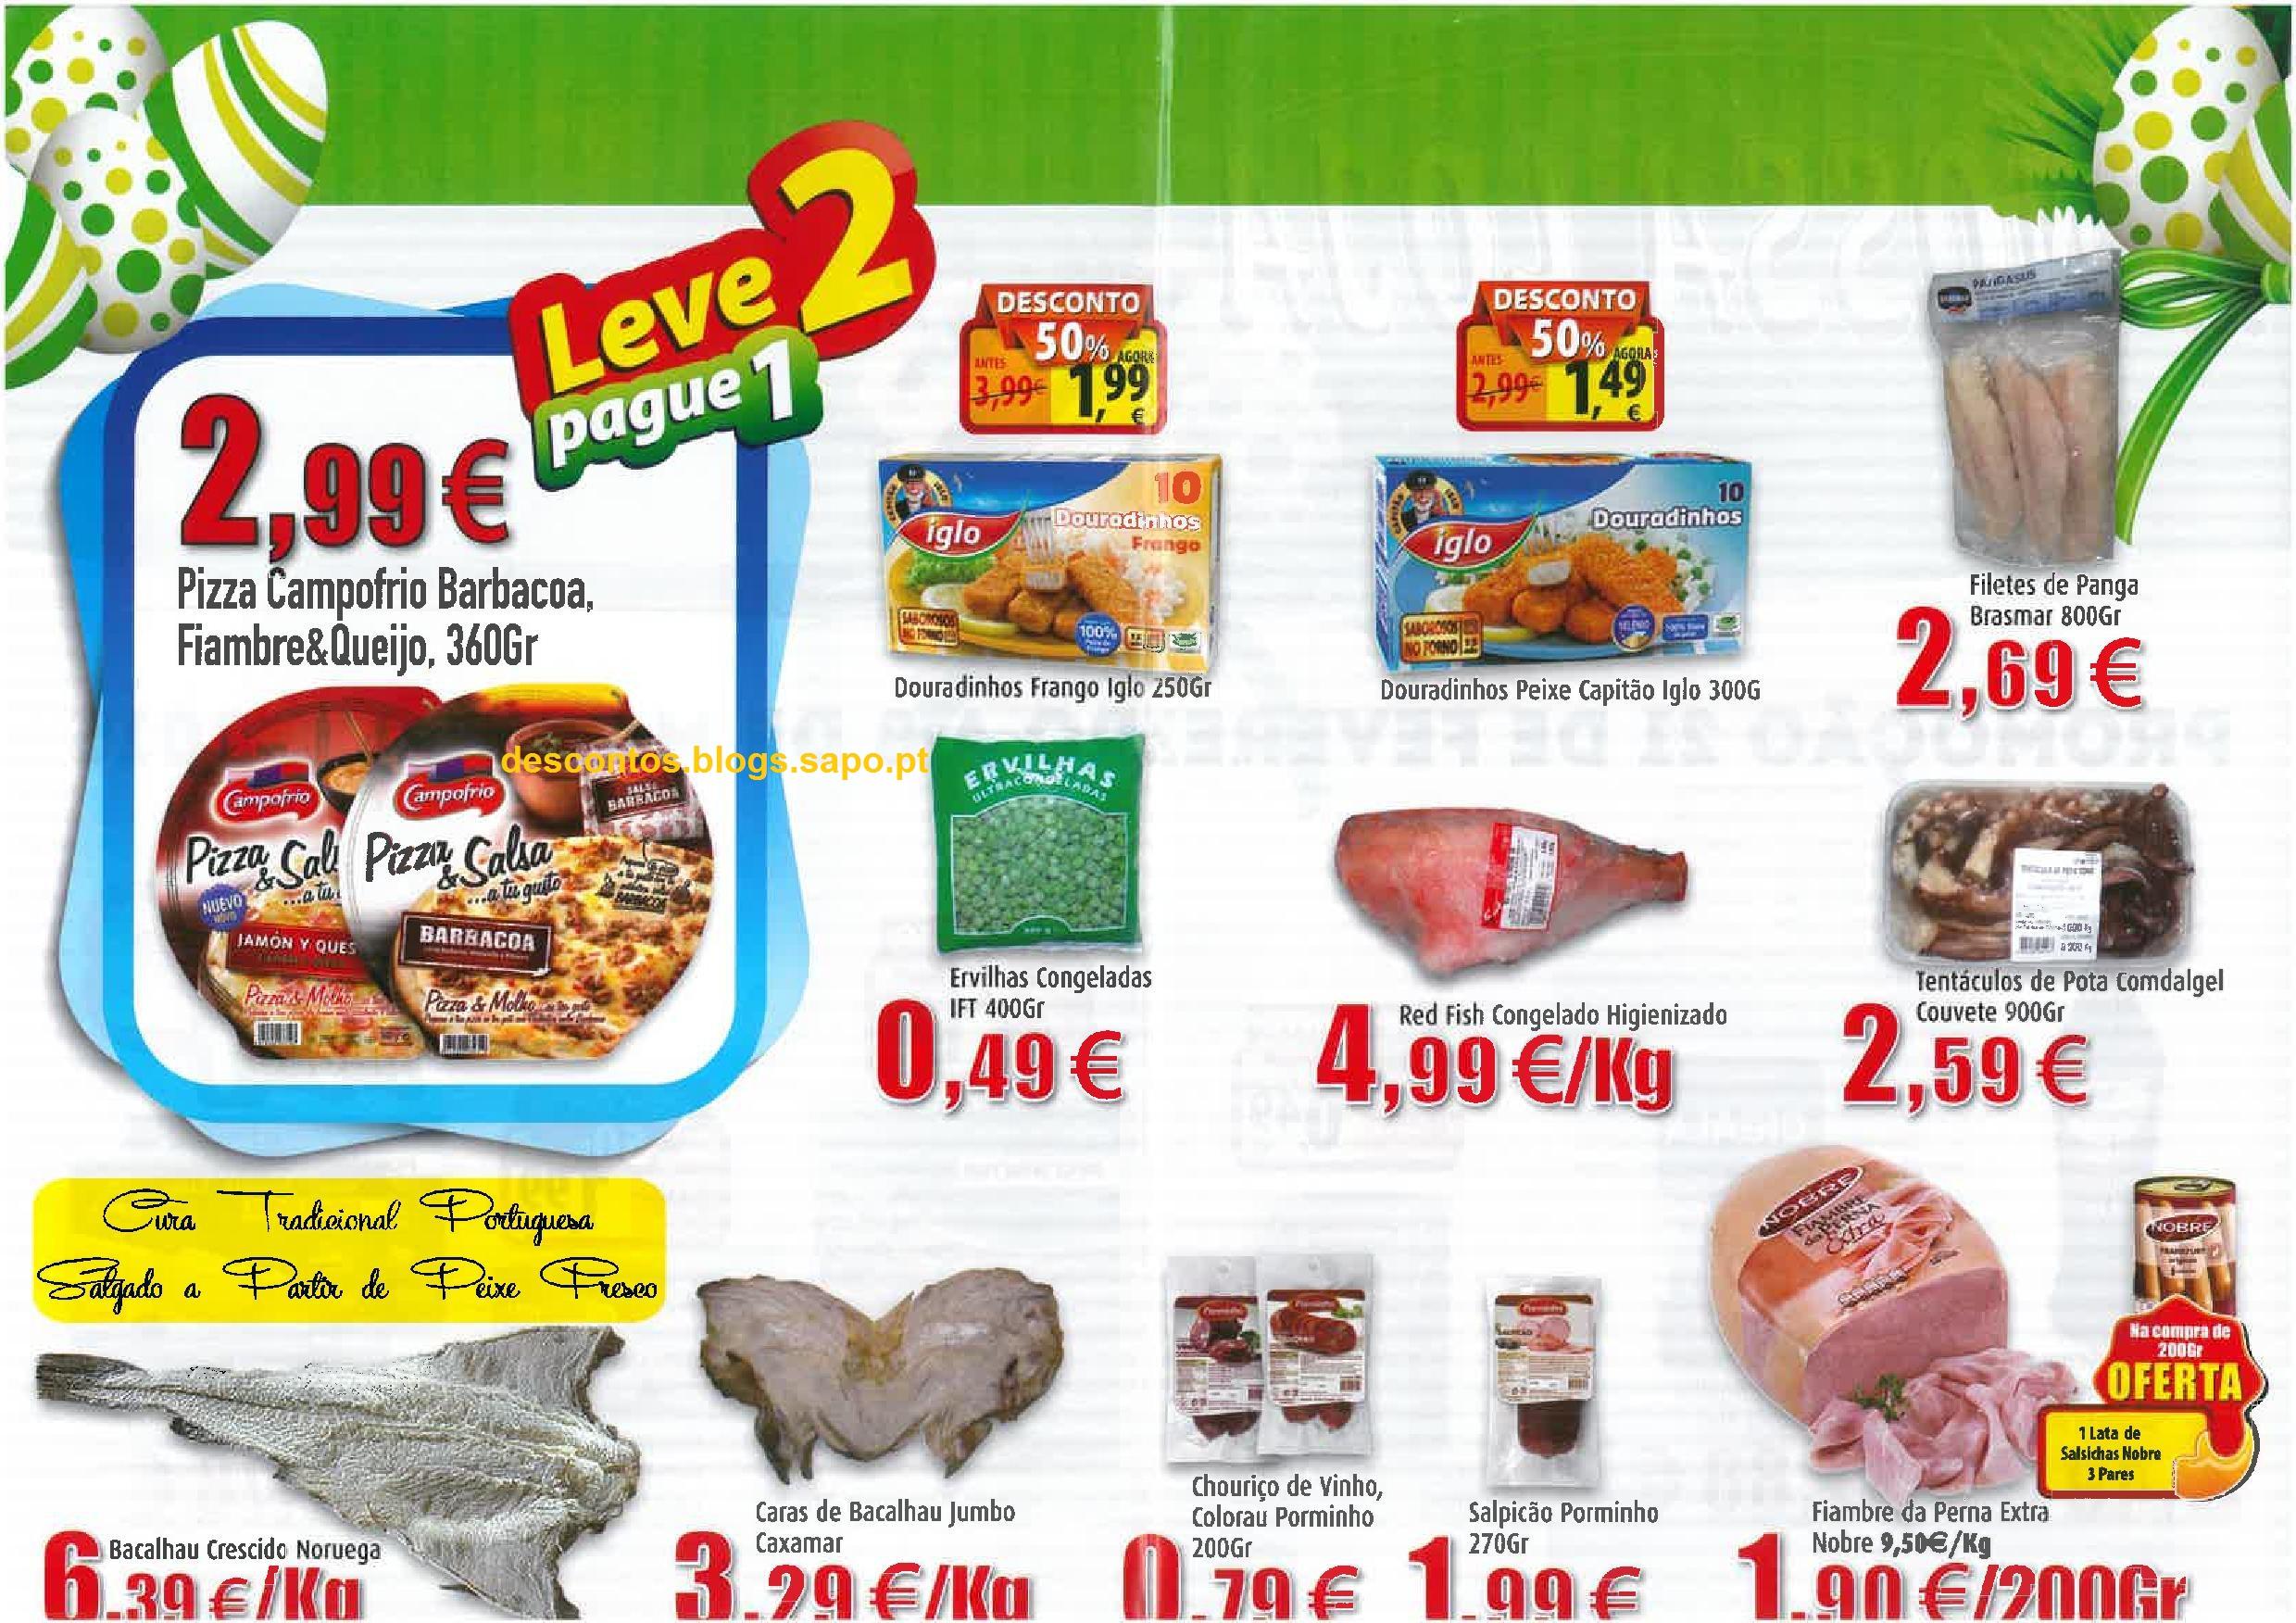 Folheto Minimercado Ribeiro 20150221-page-003.jpg